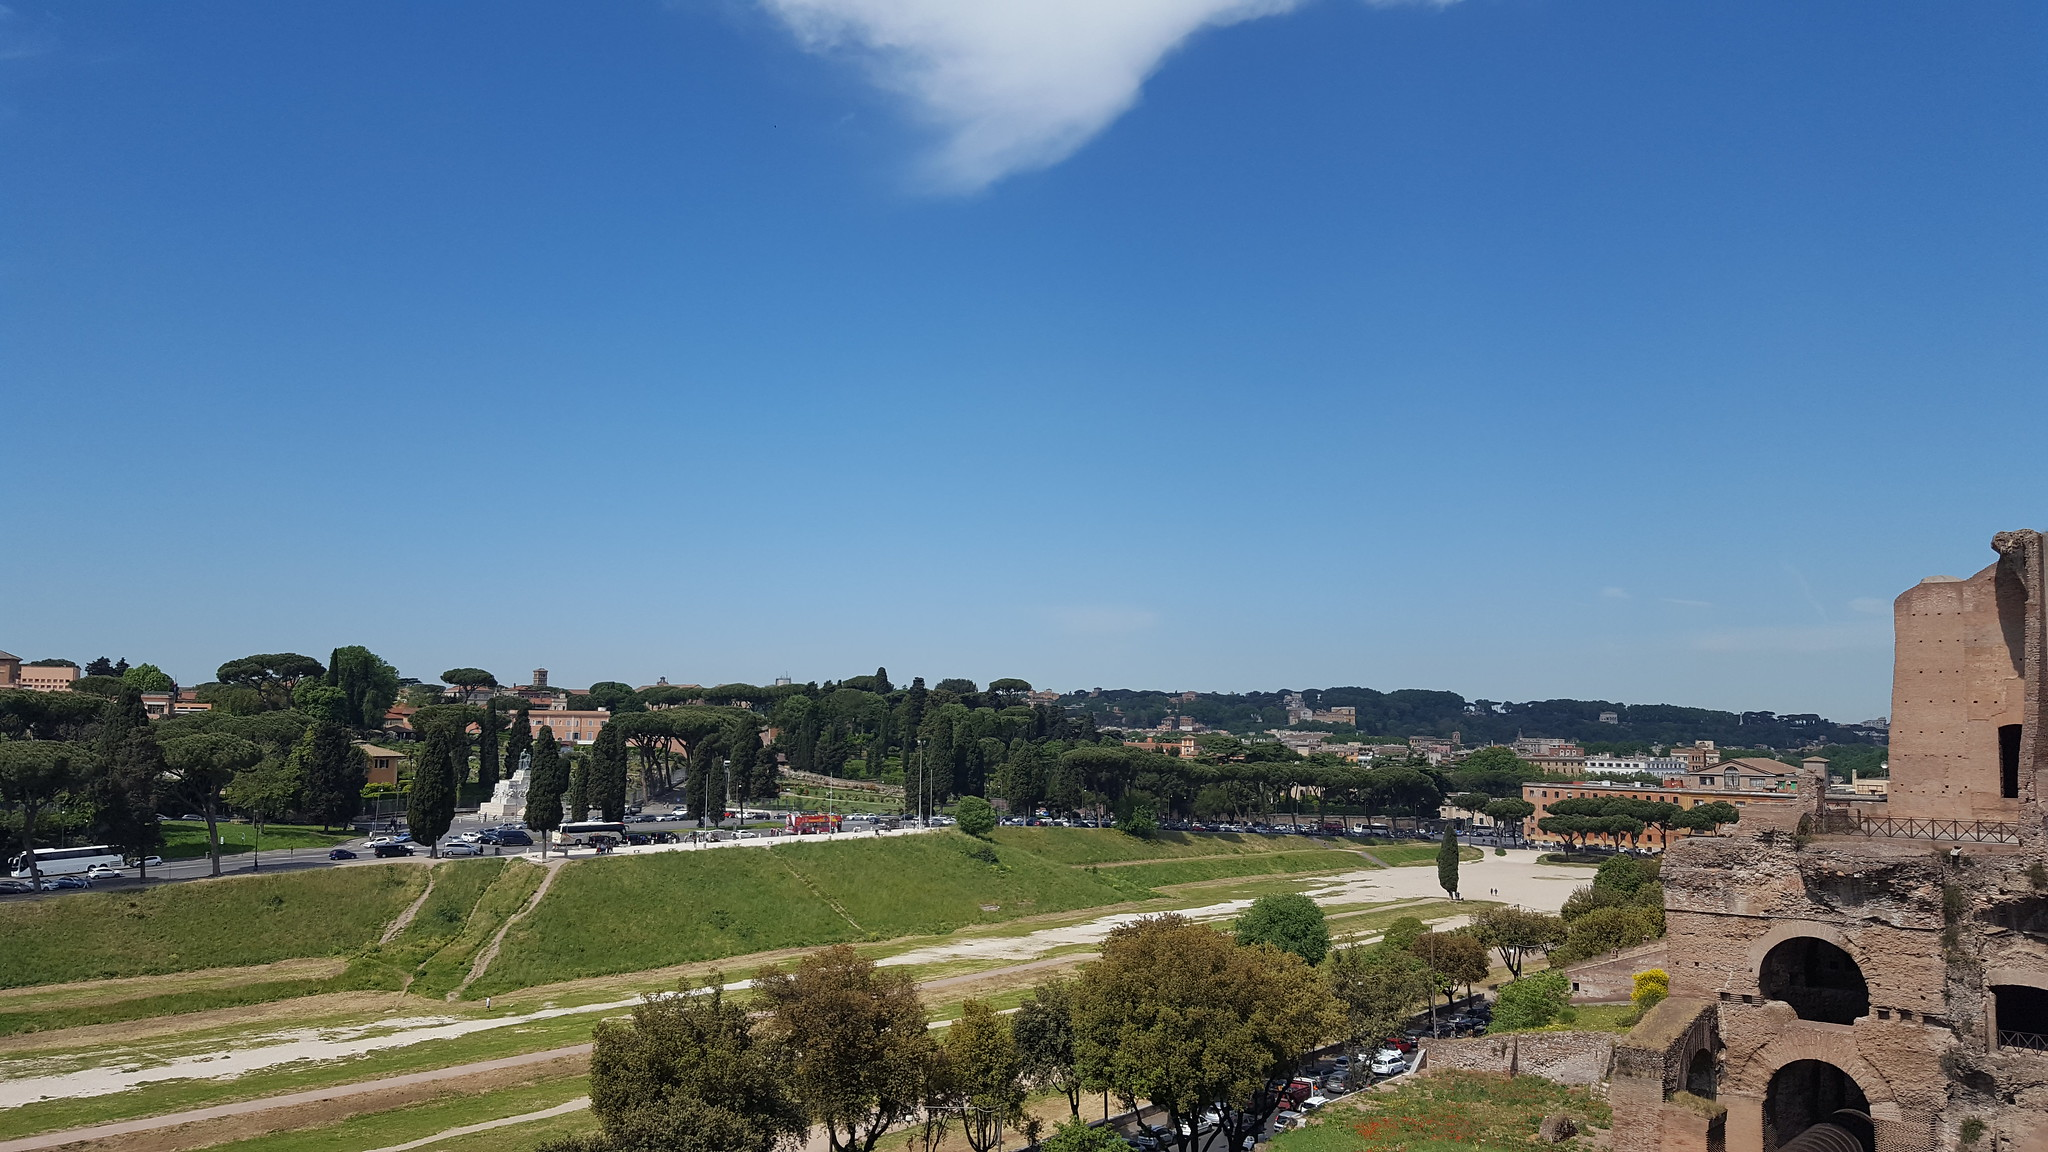 Seminar – The Ludi Romani in the Circus Maximus